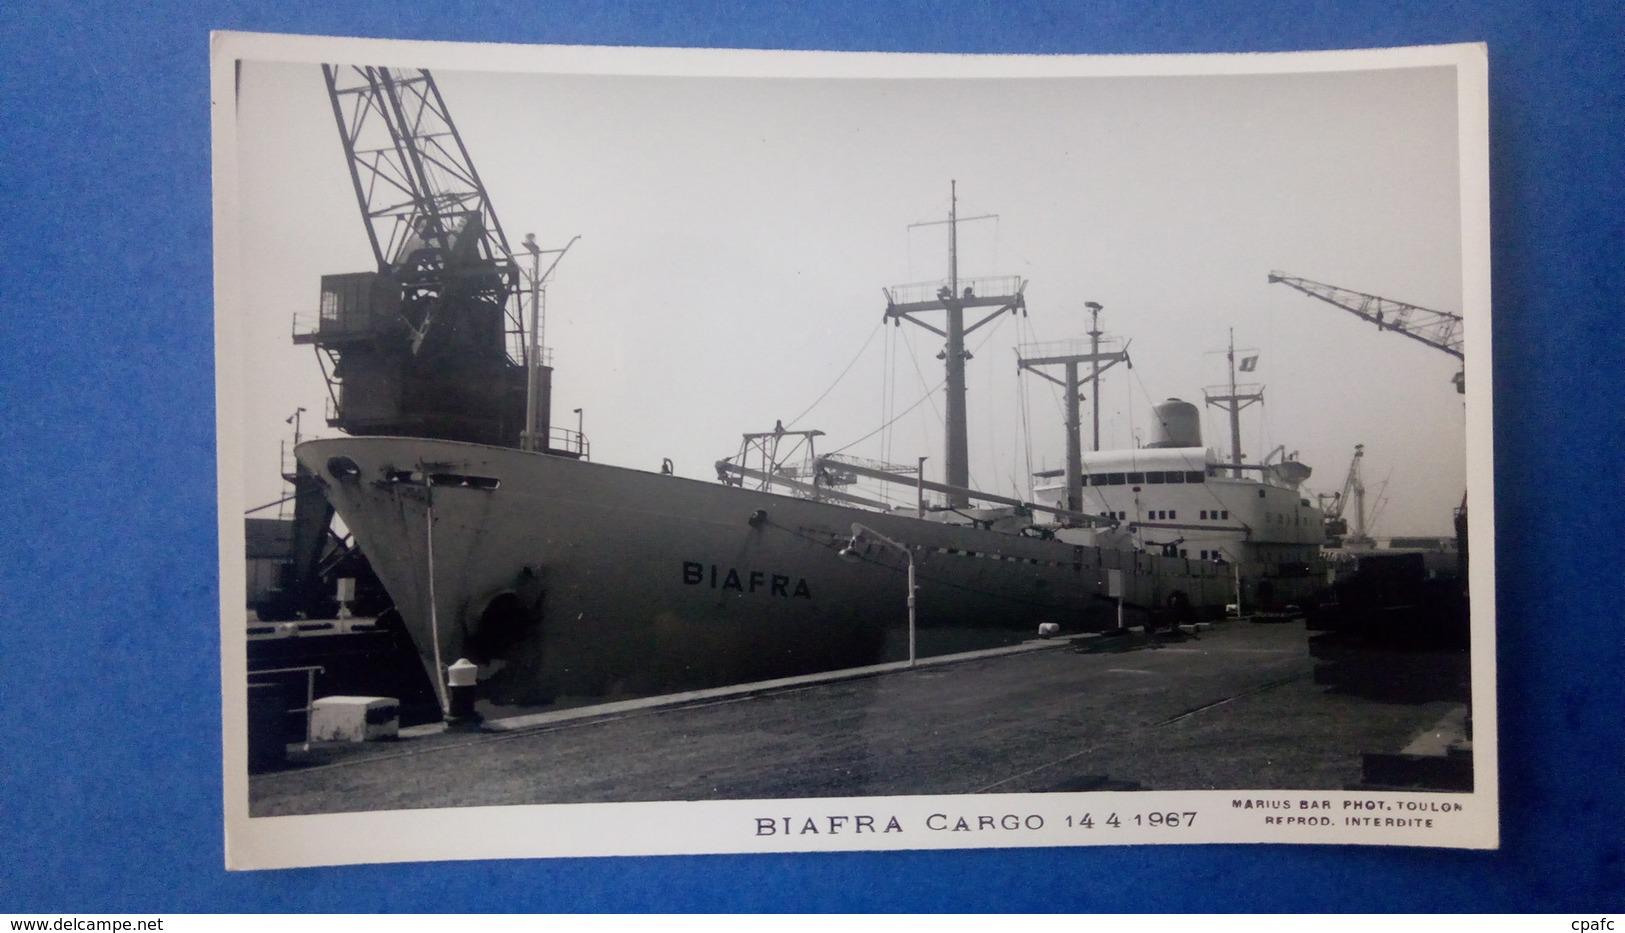 Carte Photo Du Bateau BIAFRA, Marine Marchande, Cargo, Datée De 1967 - Cargos